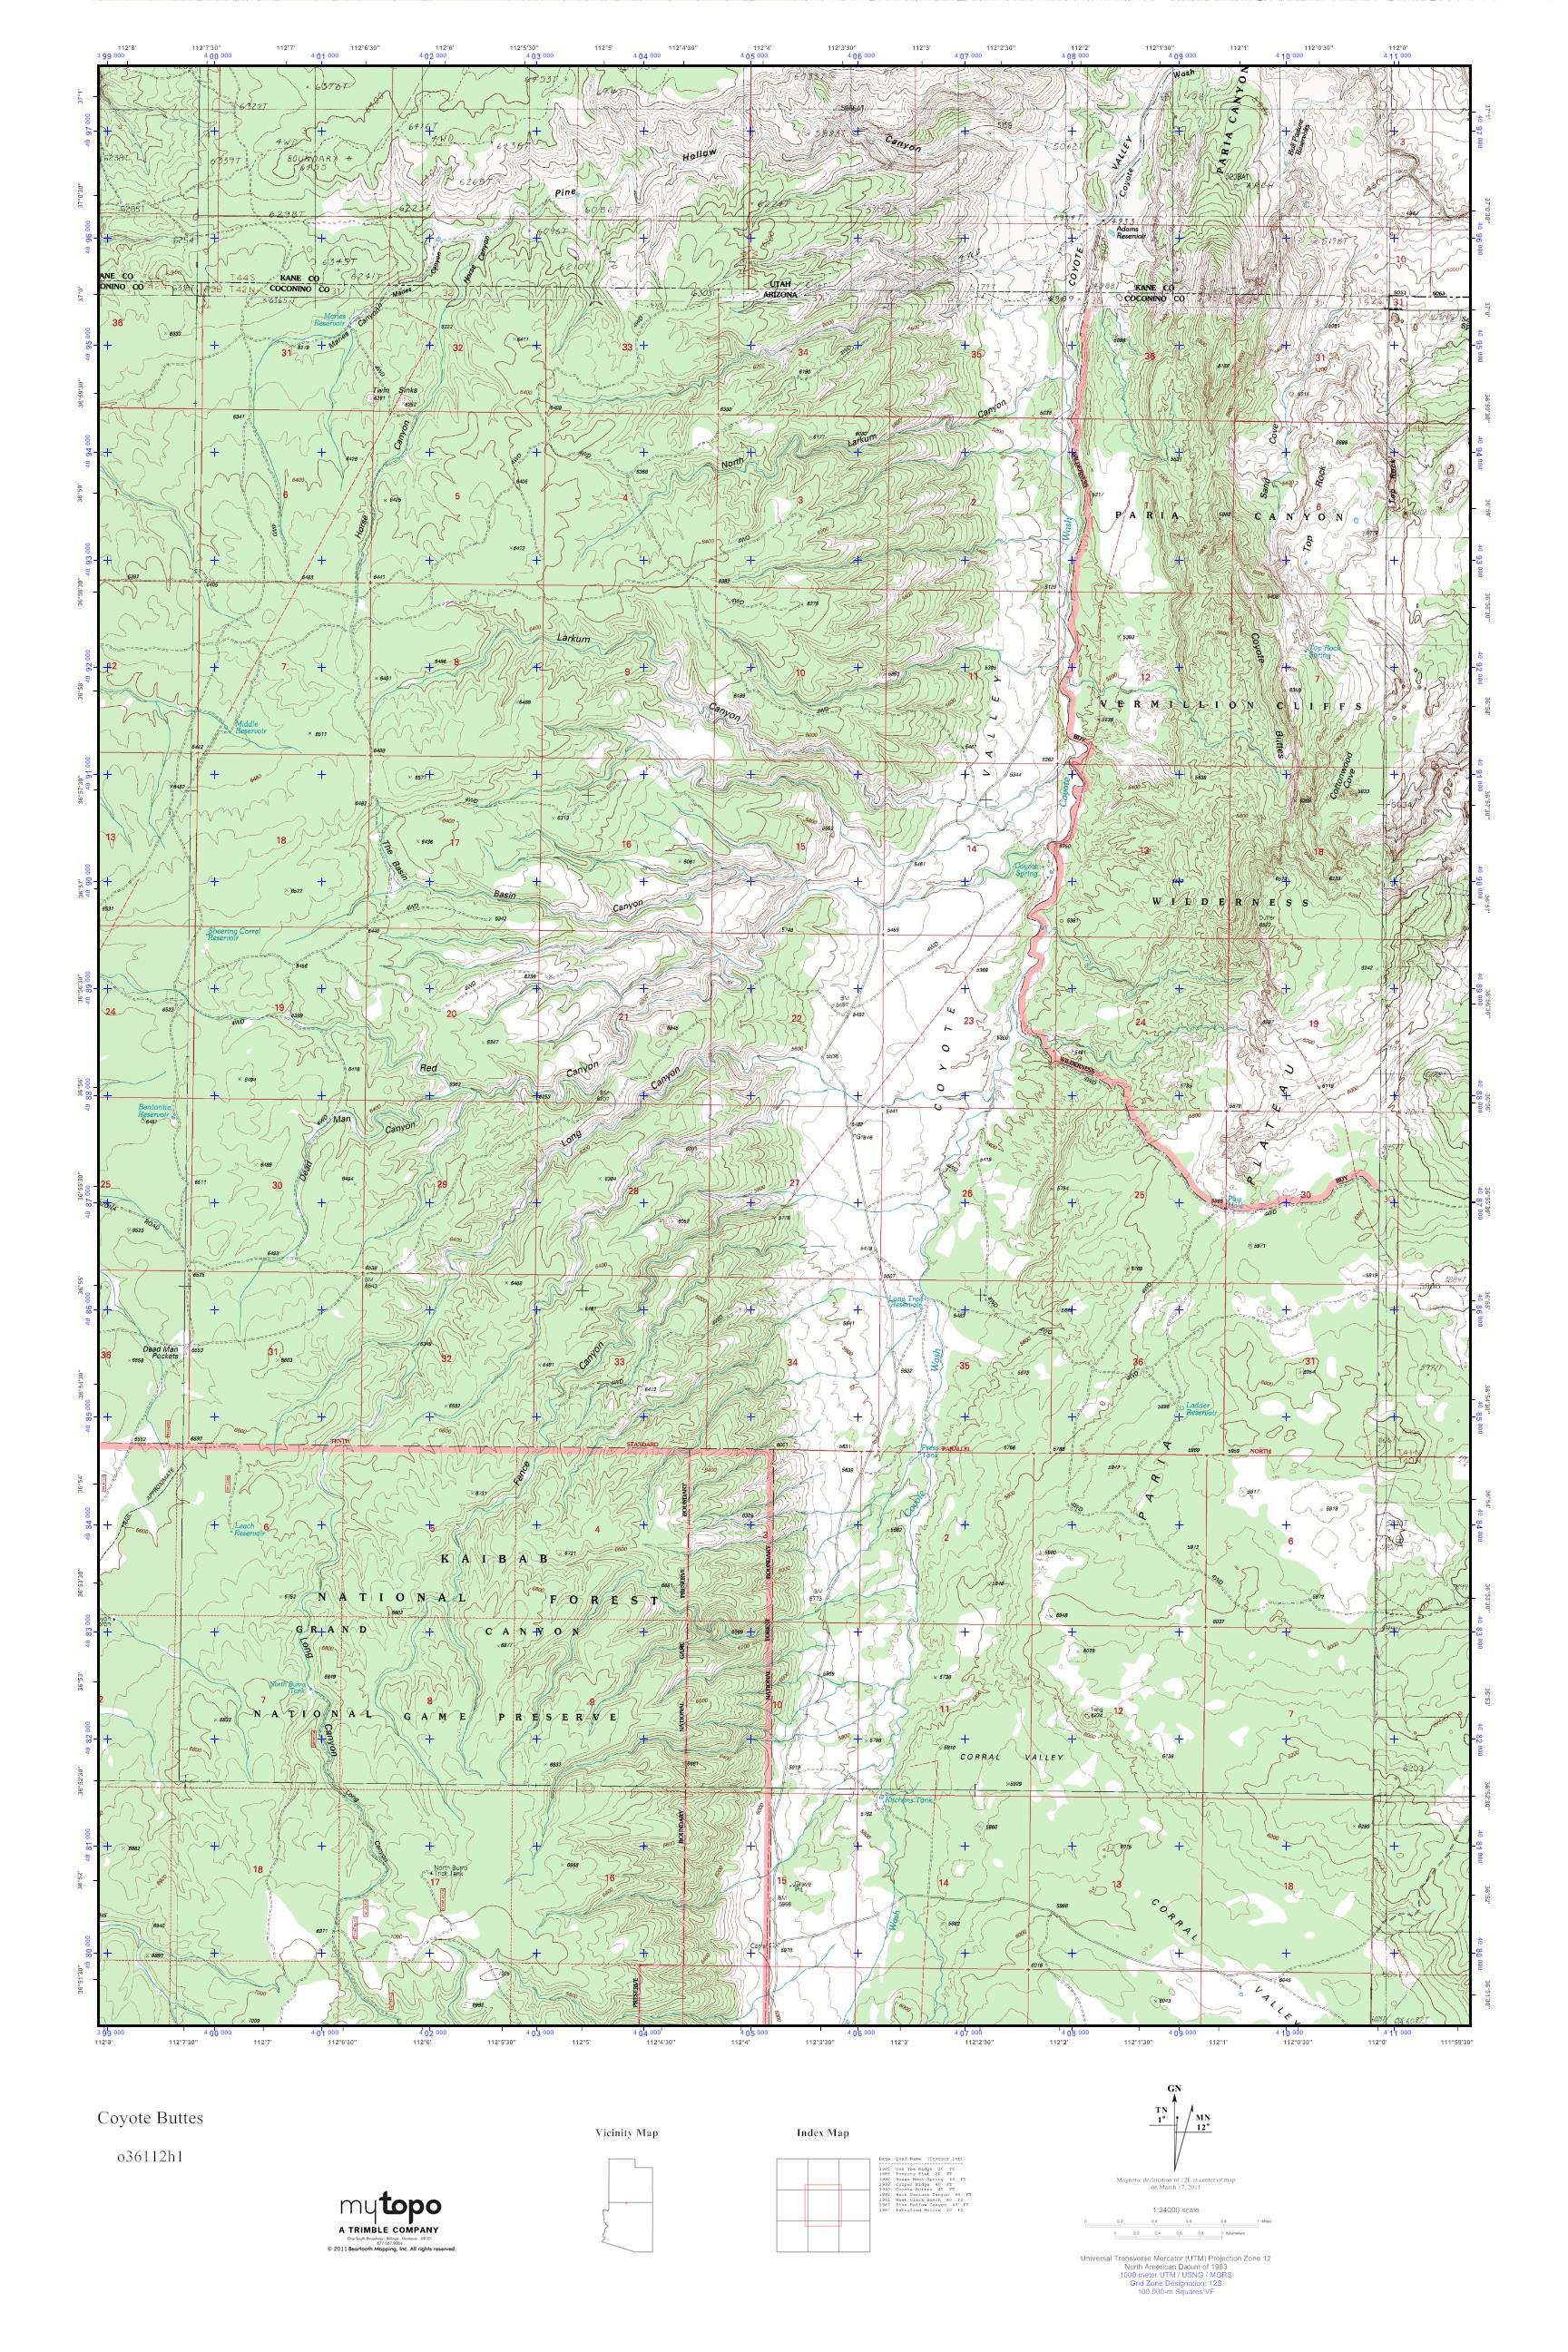 MyTopo Coyote Buttes, Arizona USGS Quad Topo Map